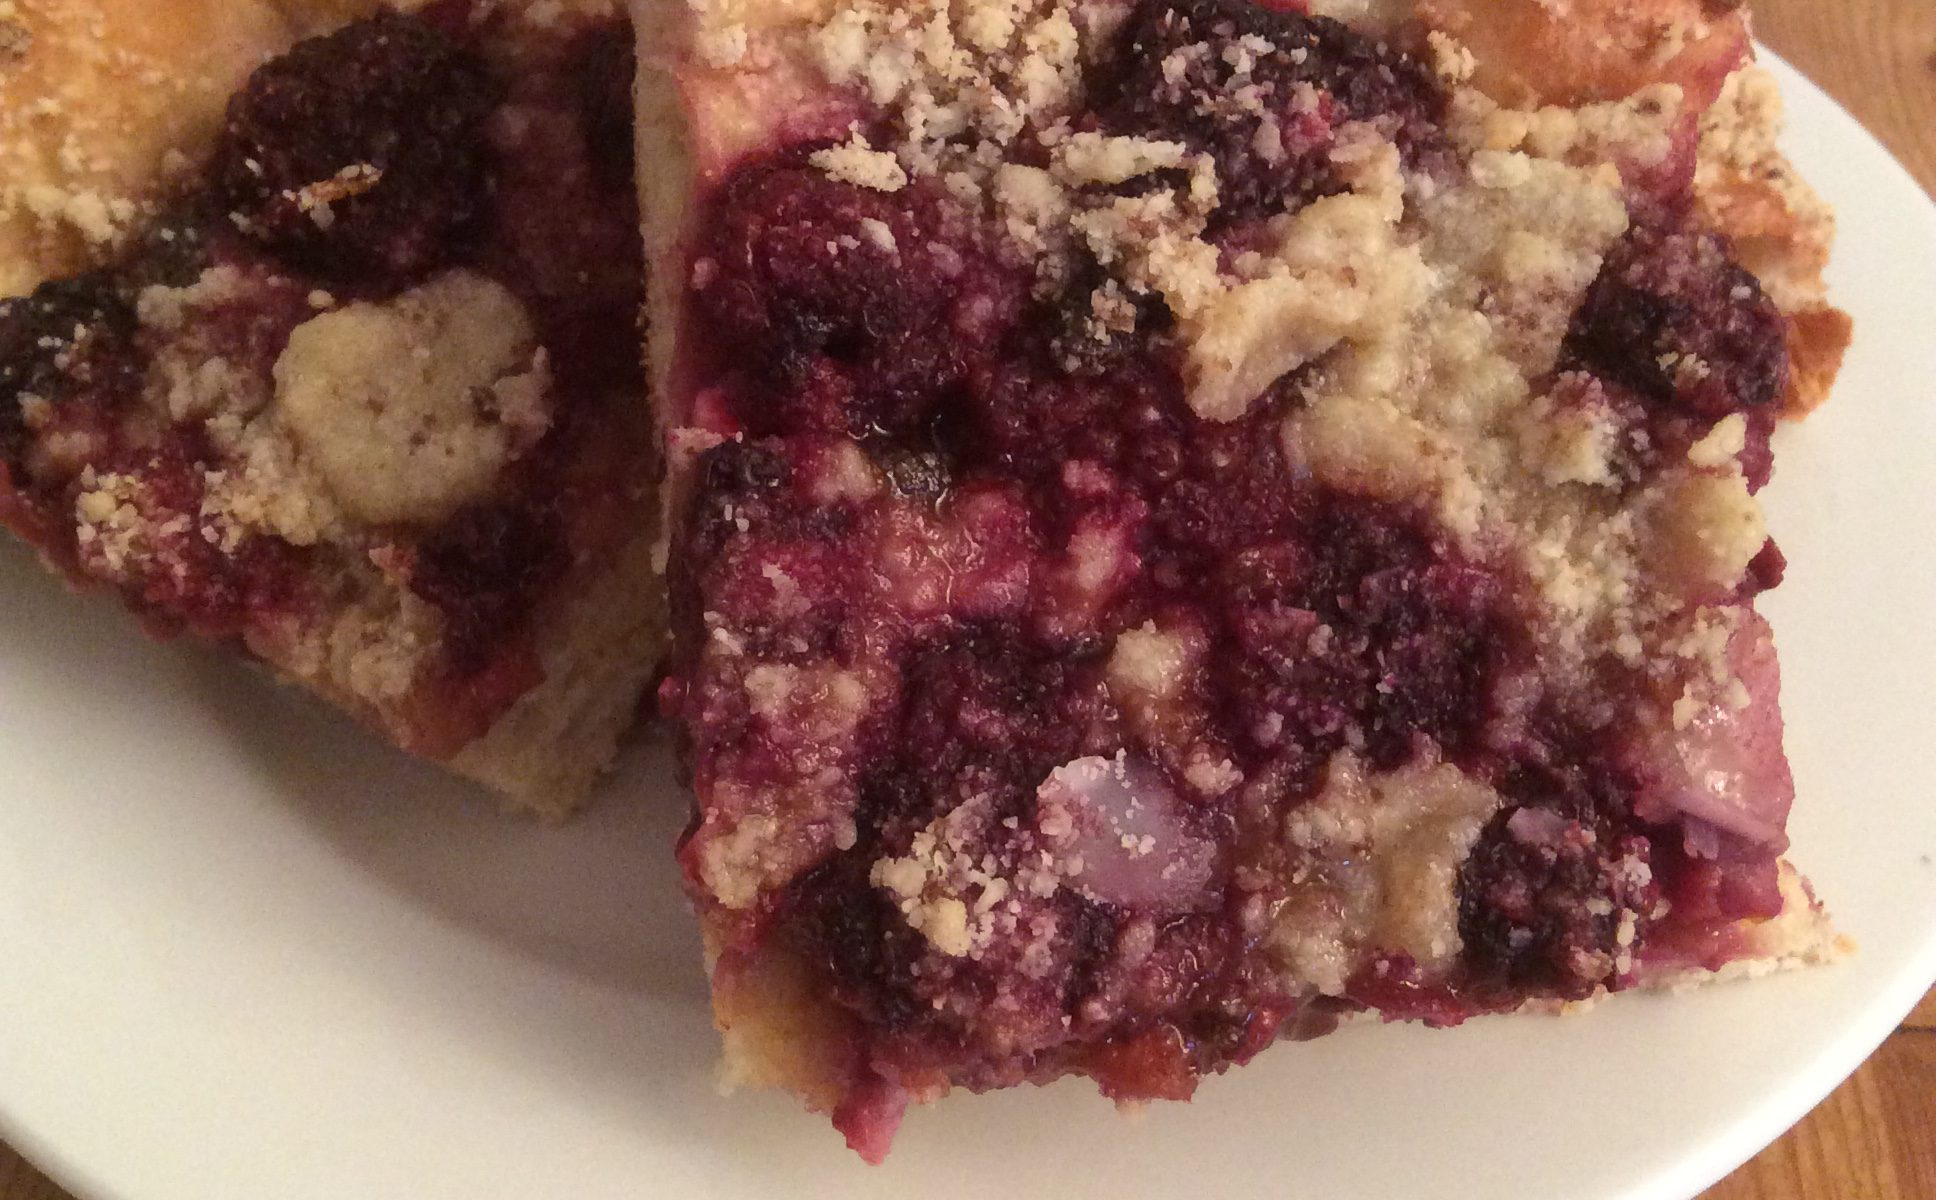 Slice of Blackberry & Almond Kuchen